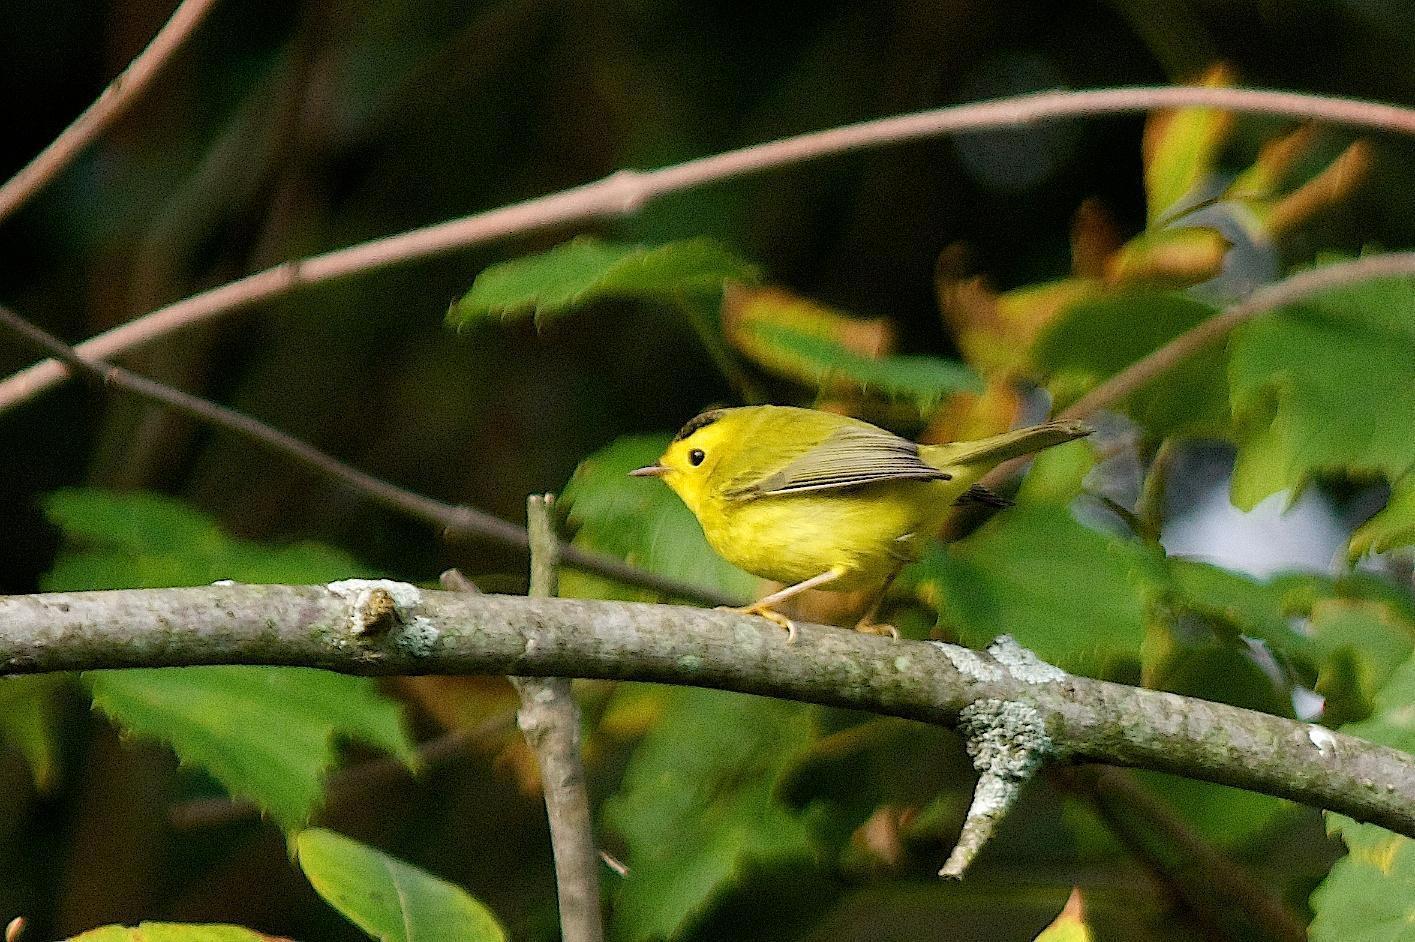 Wilson's Warbler Photo by Gerald Hoekstra